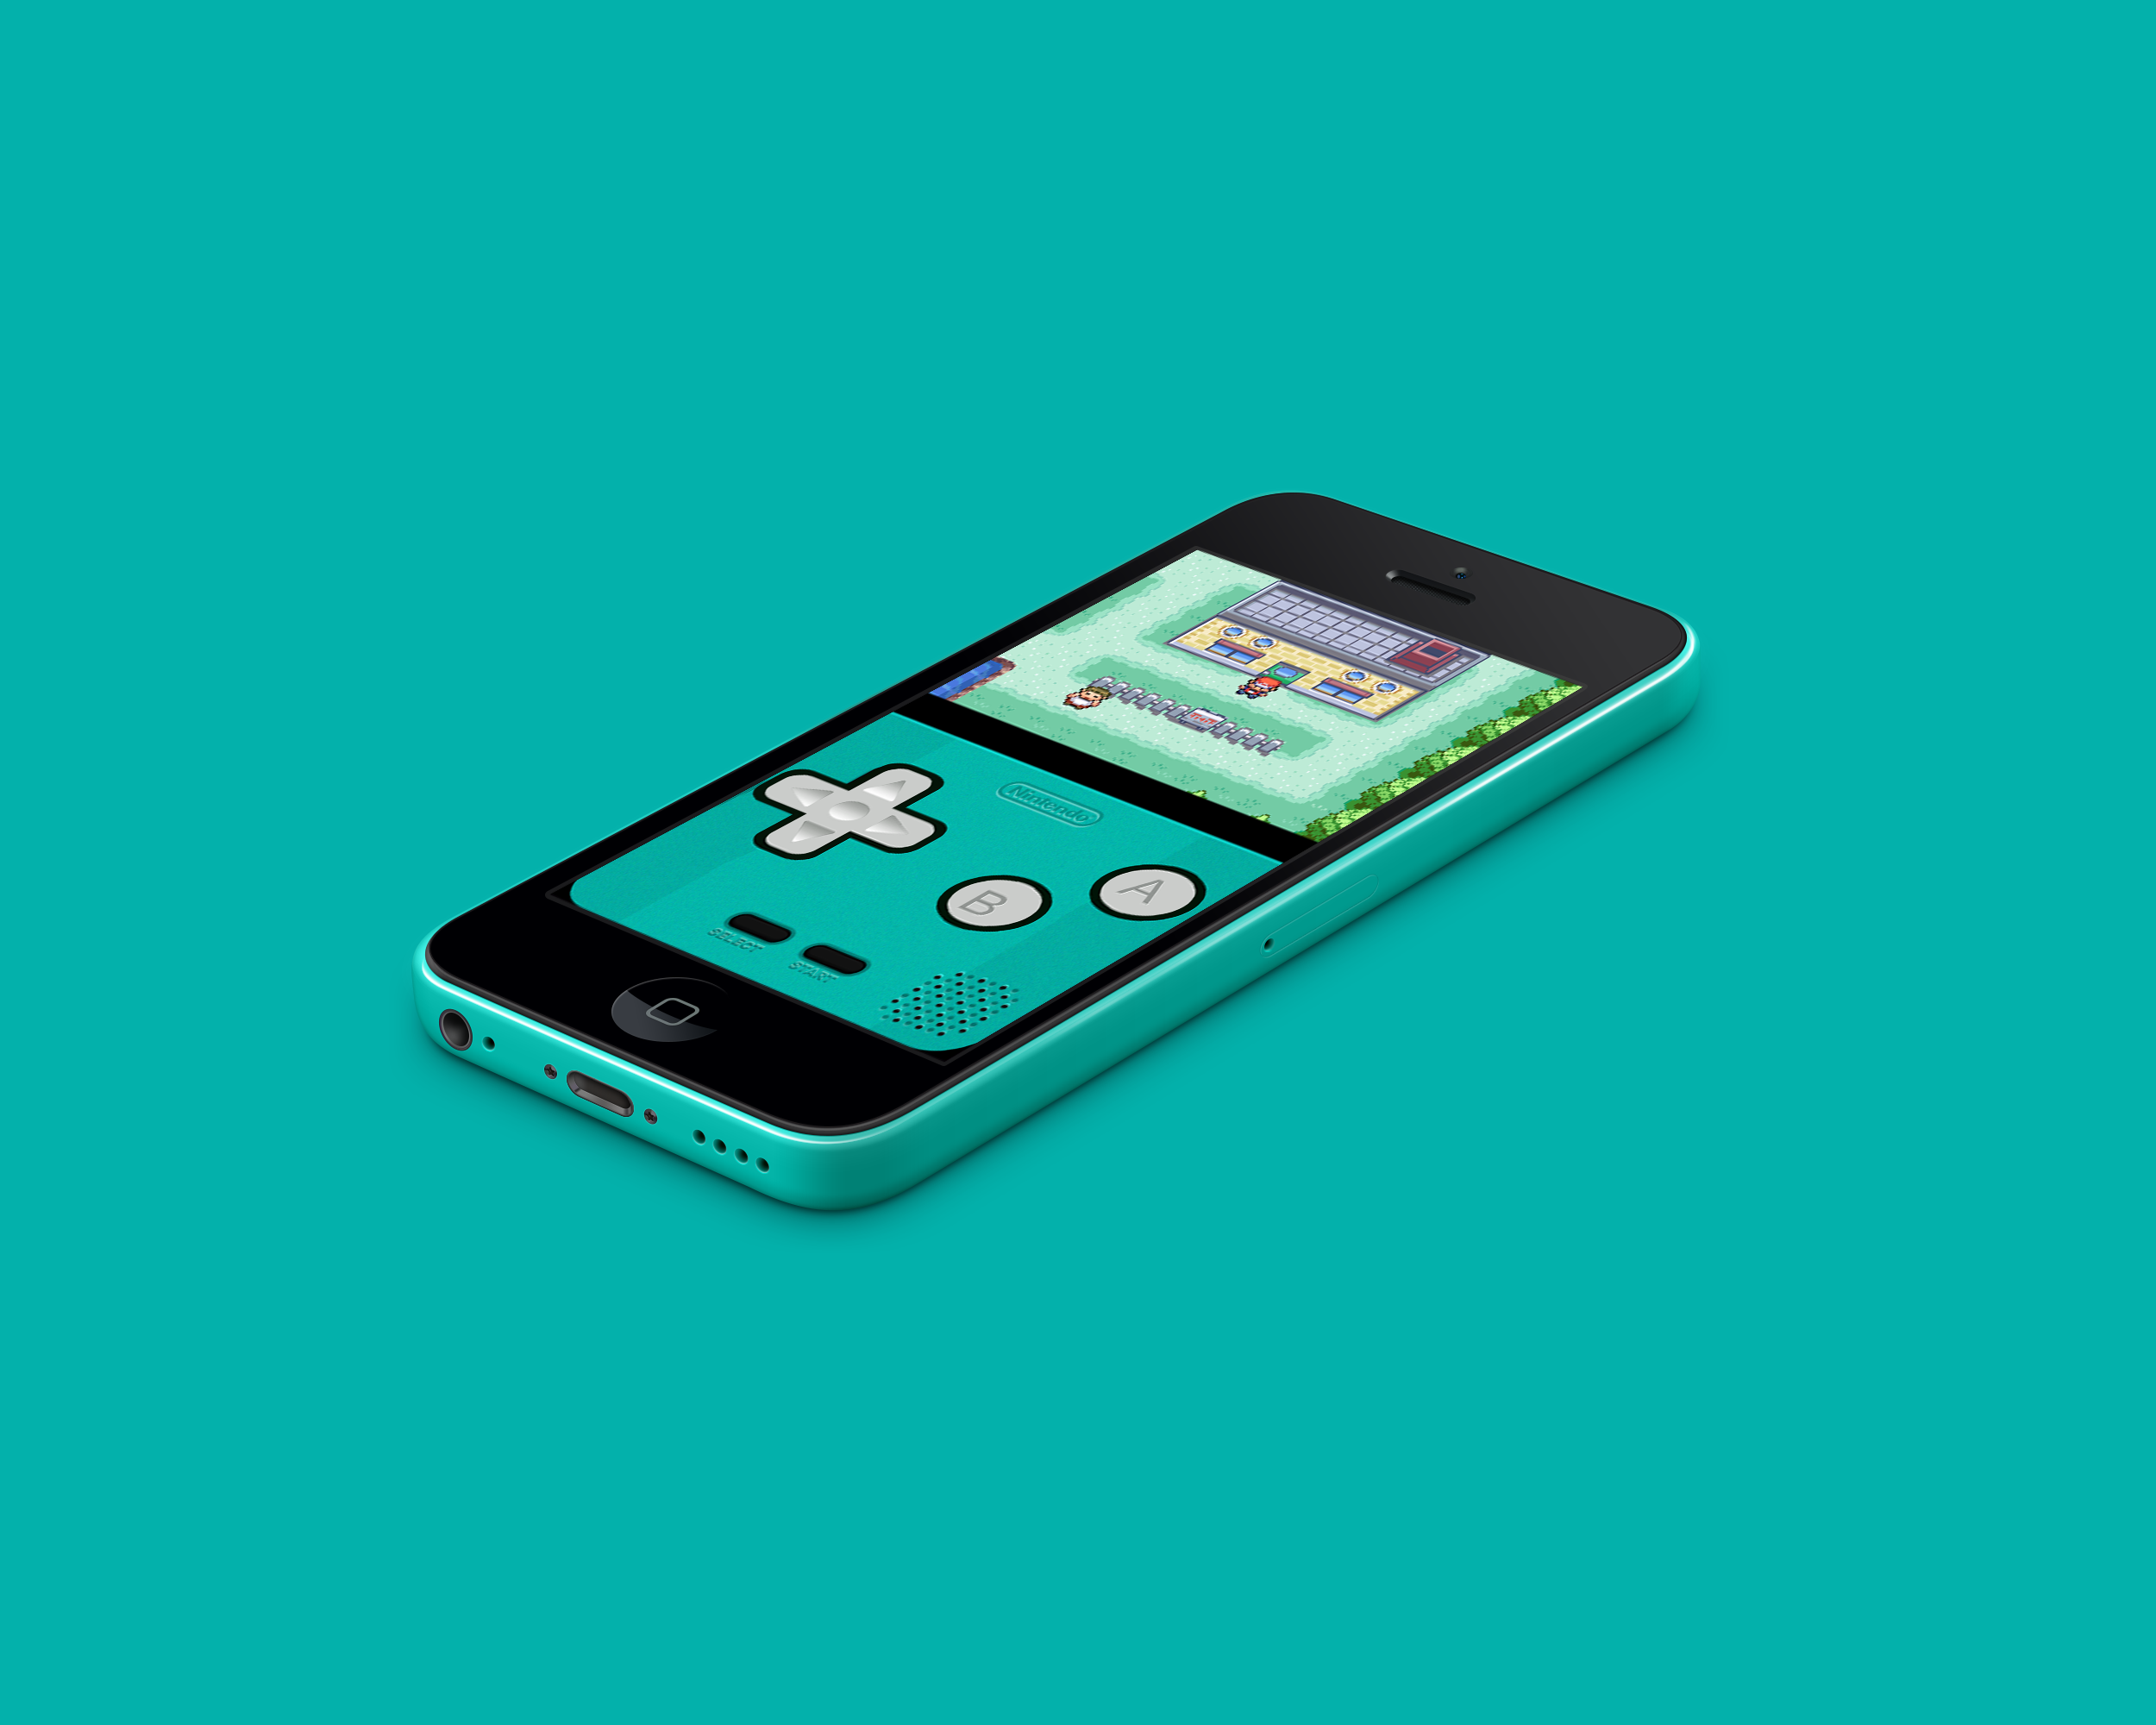 IPhone 5c GBA Teal By Vitalovitalo On DeviantArt